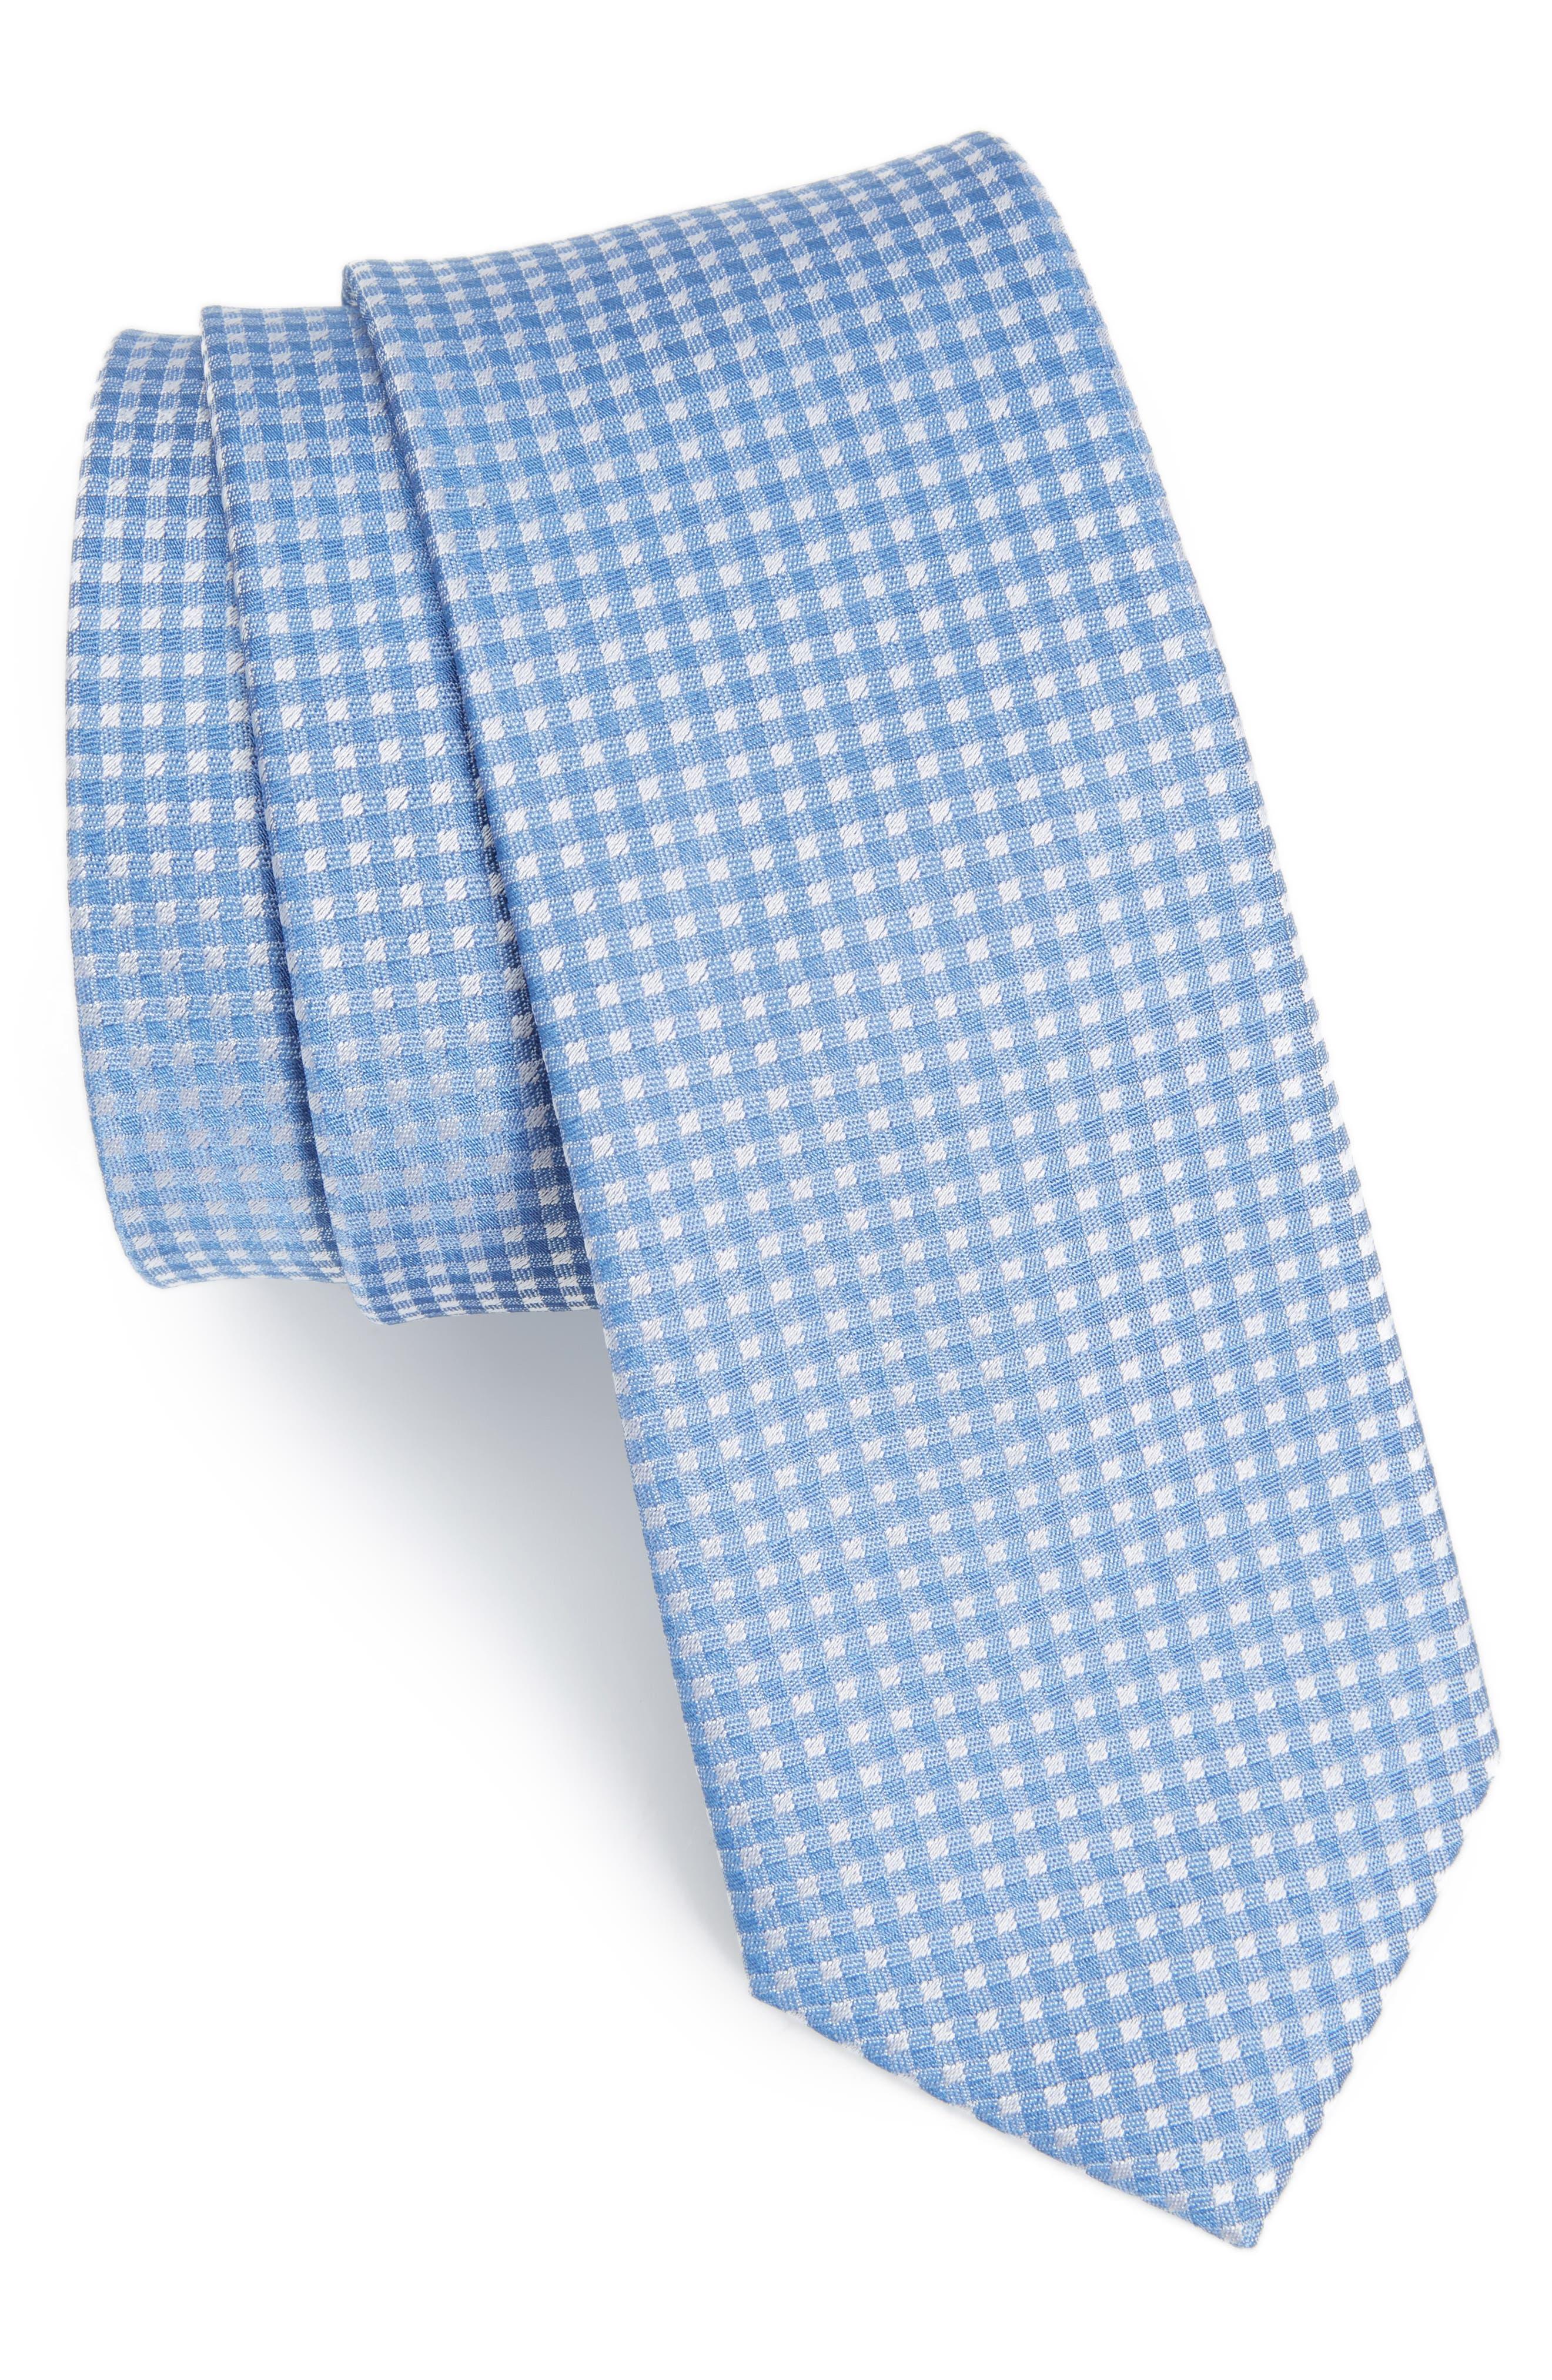 Bedrock Floral Silk Tie,                             Main thumbnail 1, color,                             700